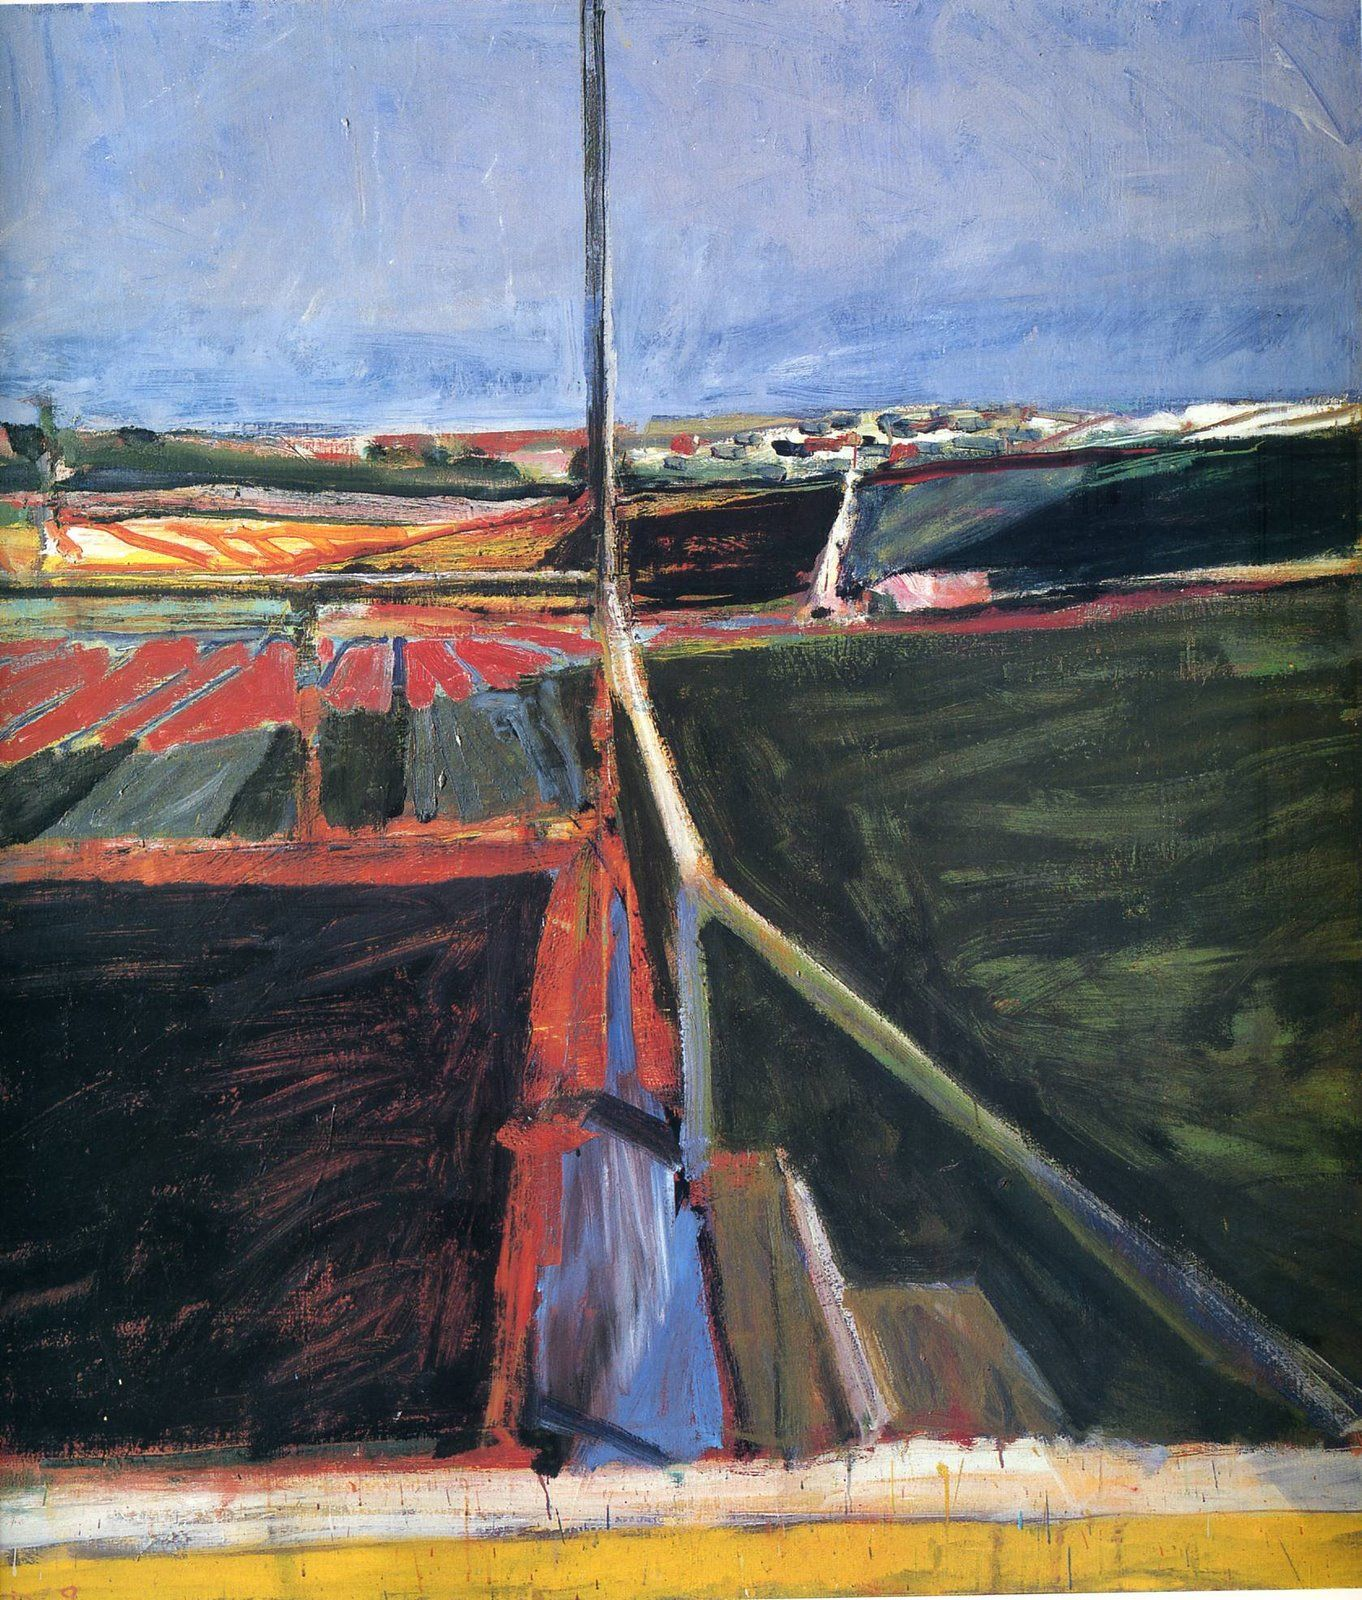 Richard Diebenkorn Interior Paintings | Richard Diebenkorn